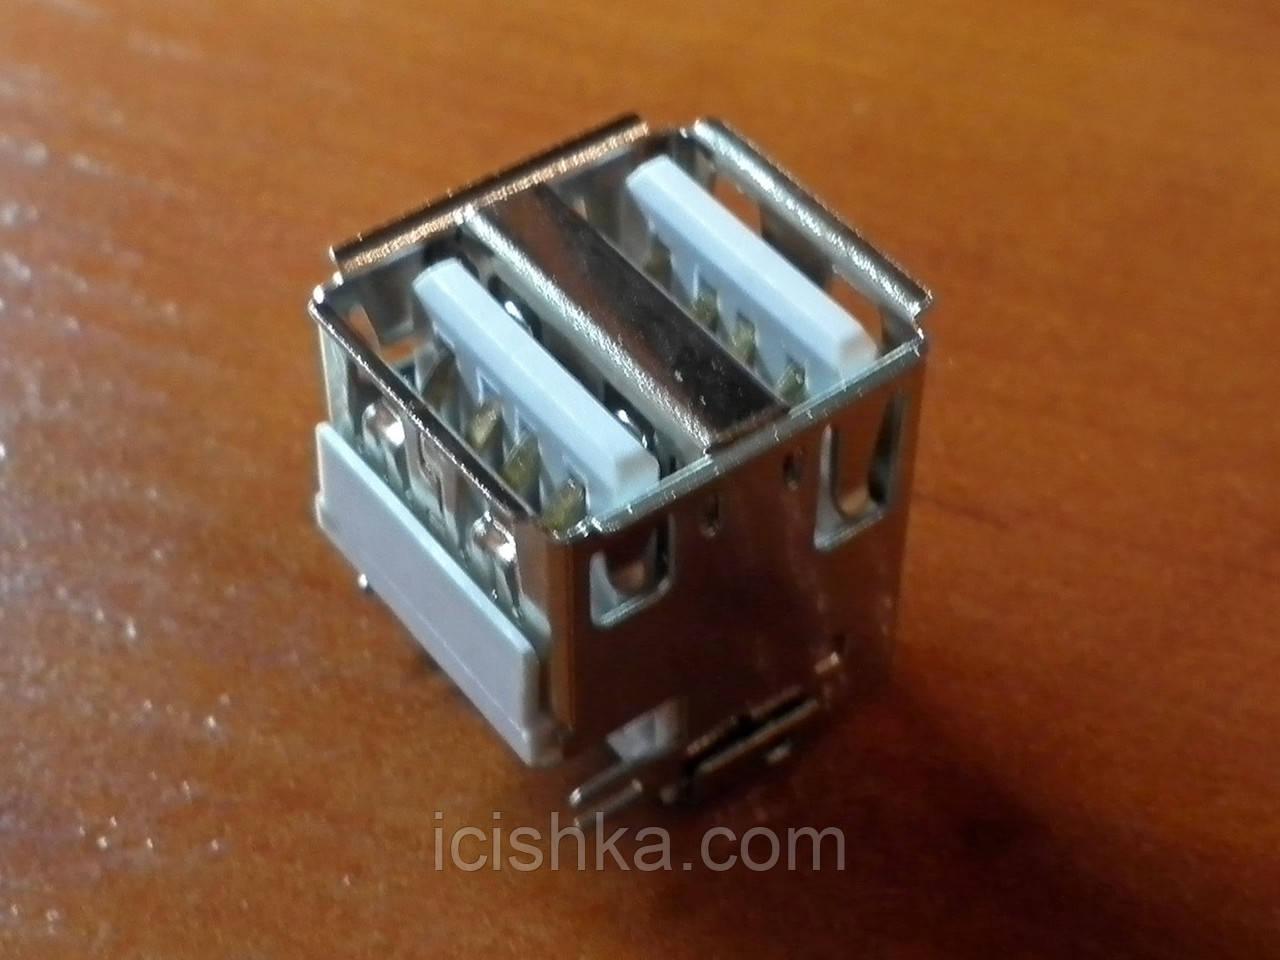 Double USB A Female - двойной юсб коннектор разъем